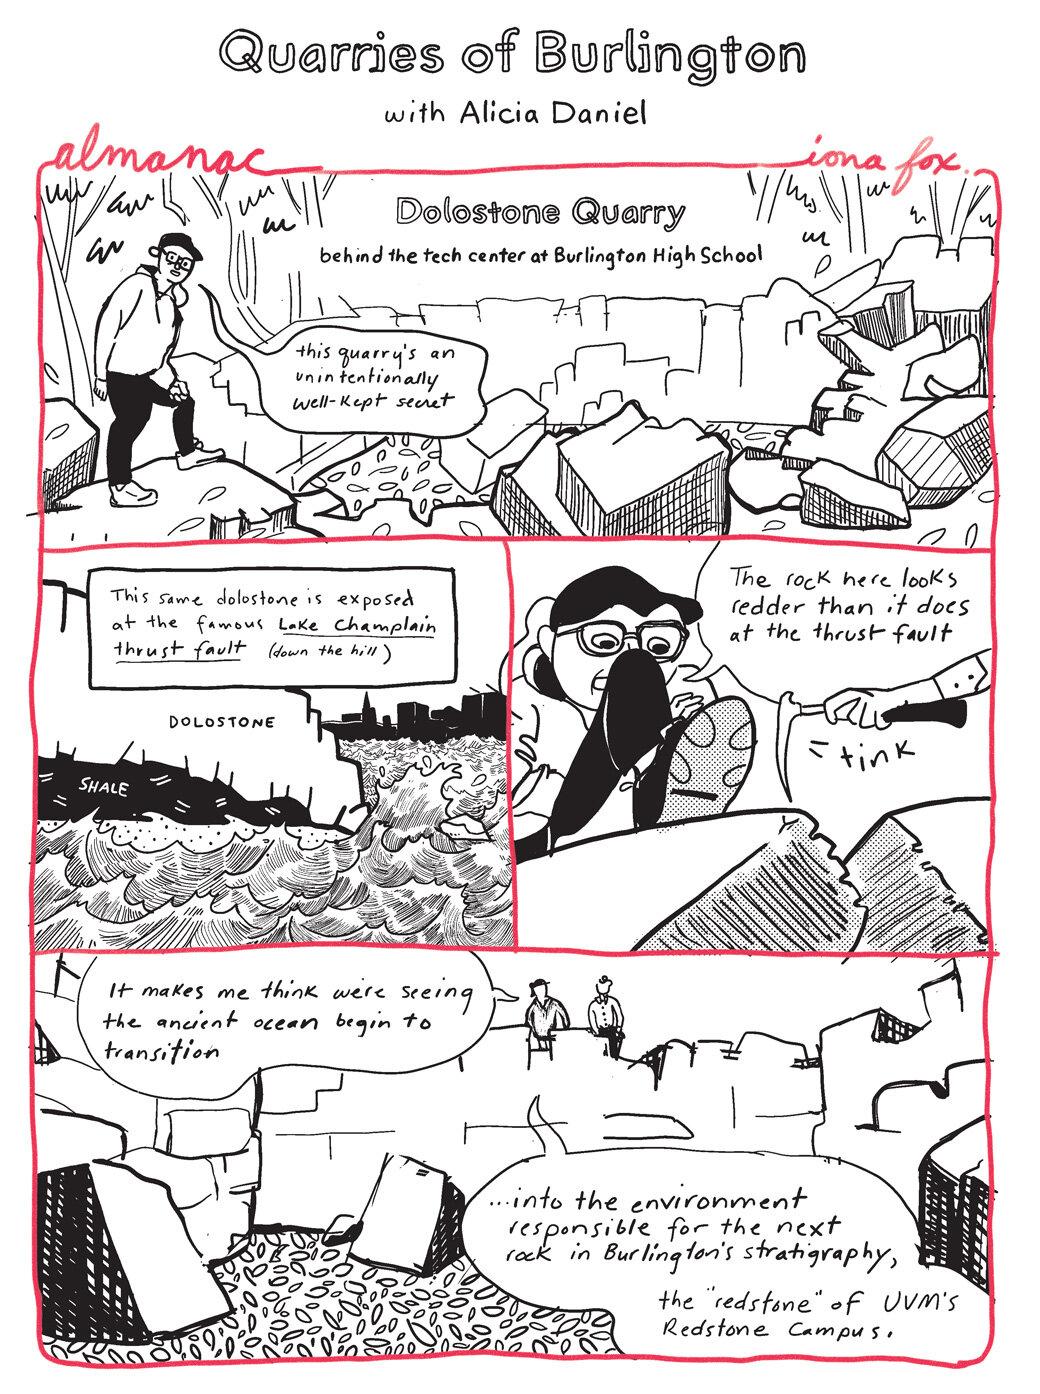 Iona-Woolmington-Dolostone-Quarry.jpg